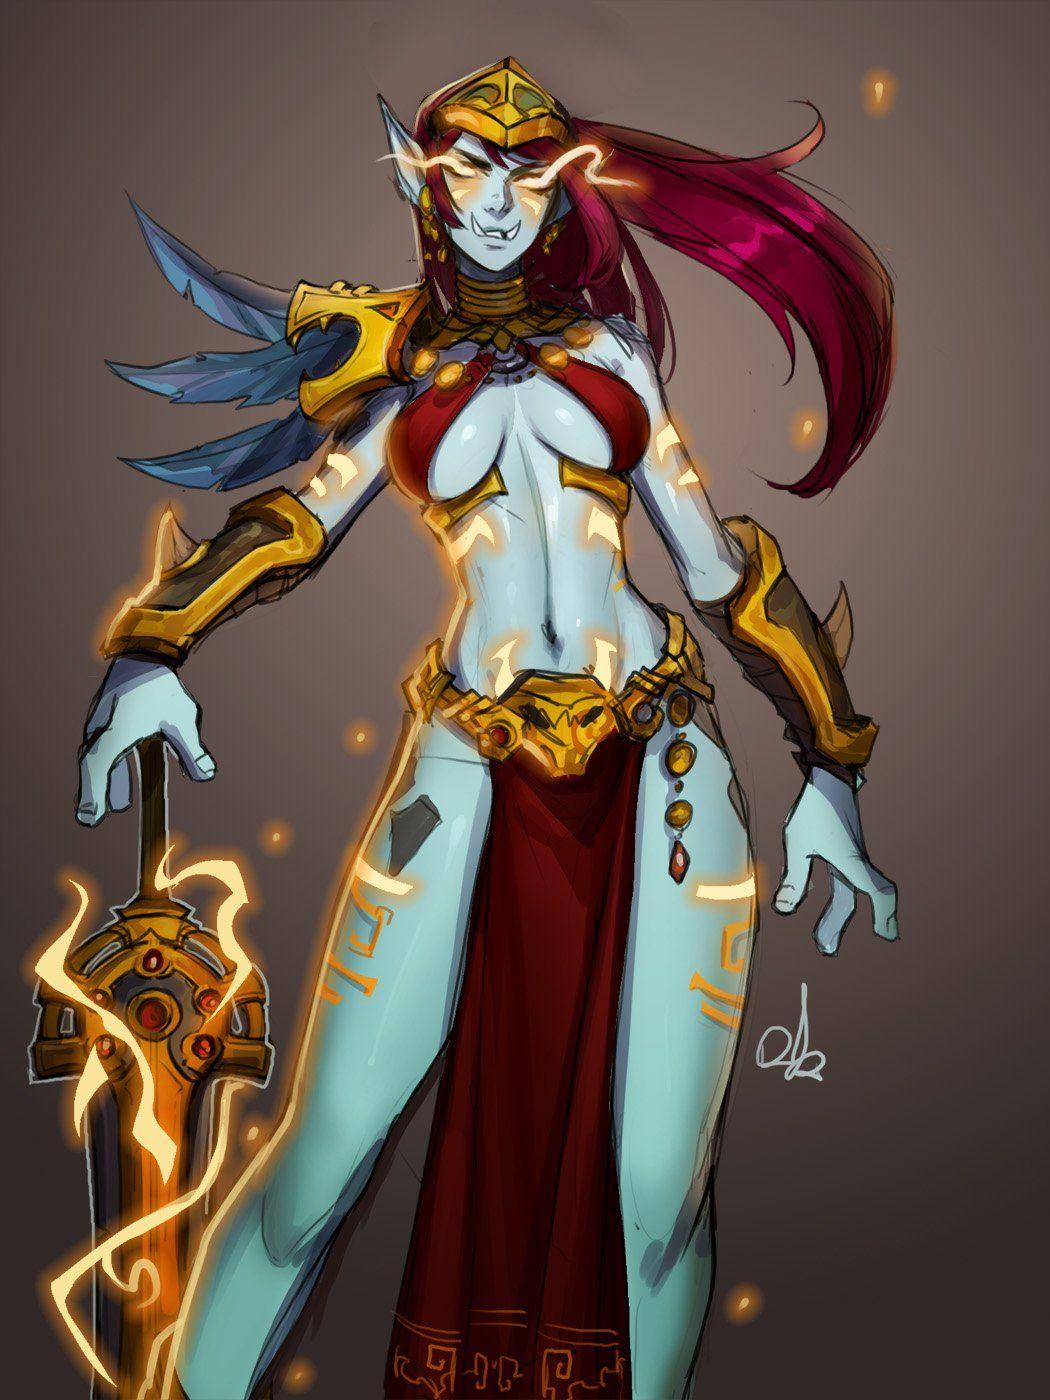 Zandalari Paladin by Distr Art | Warcraft characters